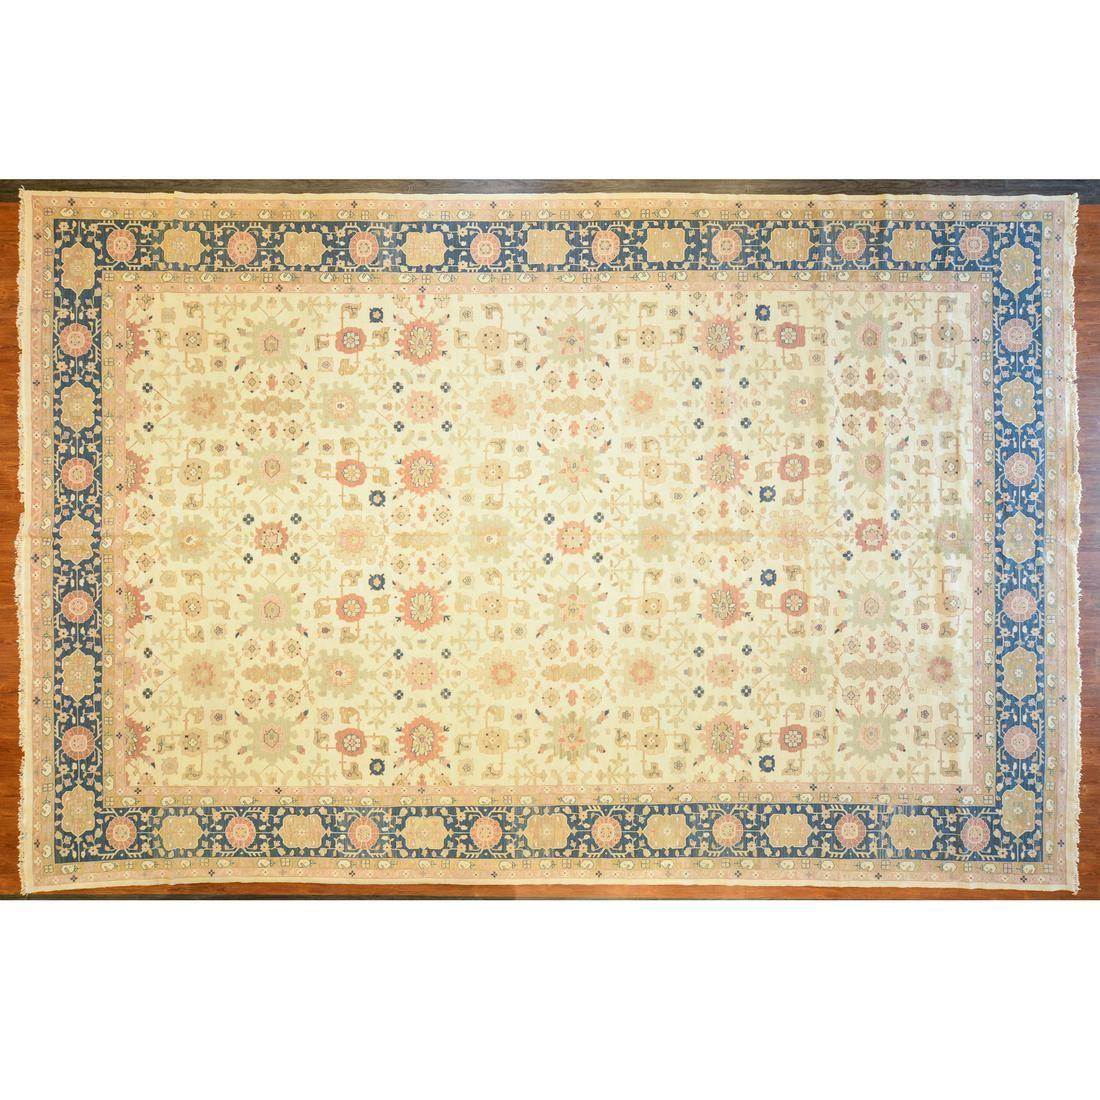 Soumak Carpet, Persia, 12 x 18